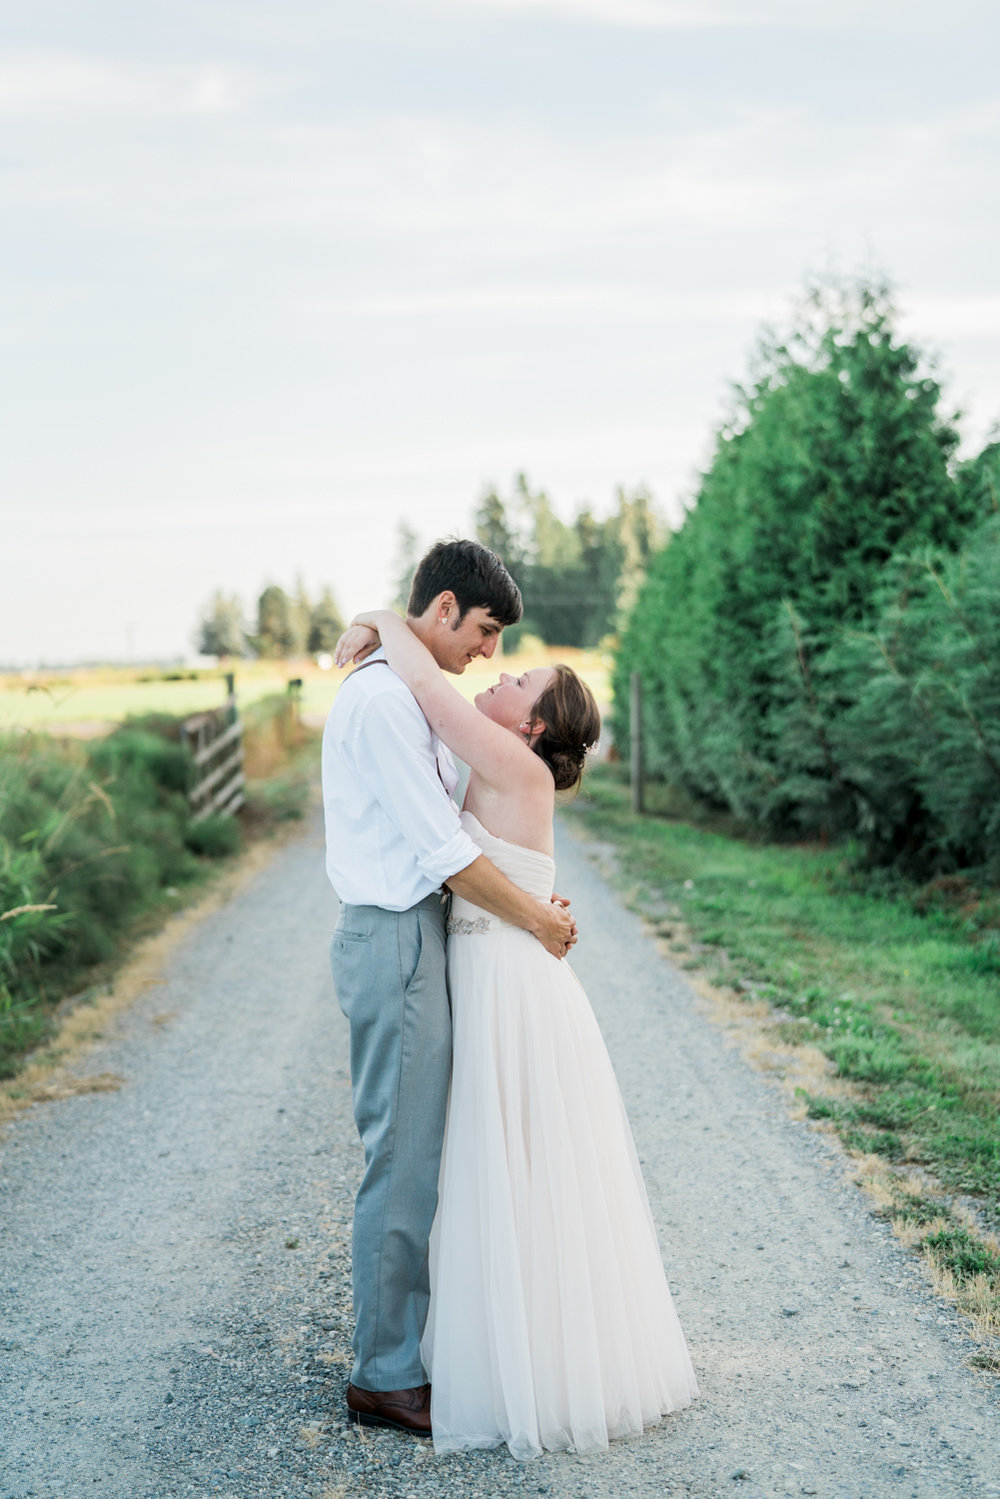 April Yentas Photography - Hannah & Ian-57.jpg